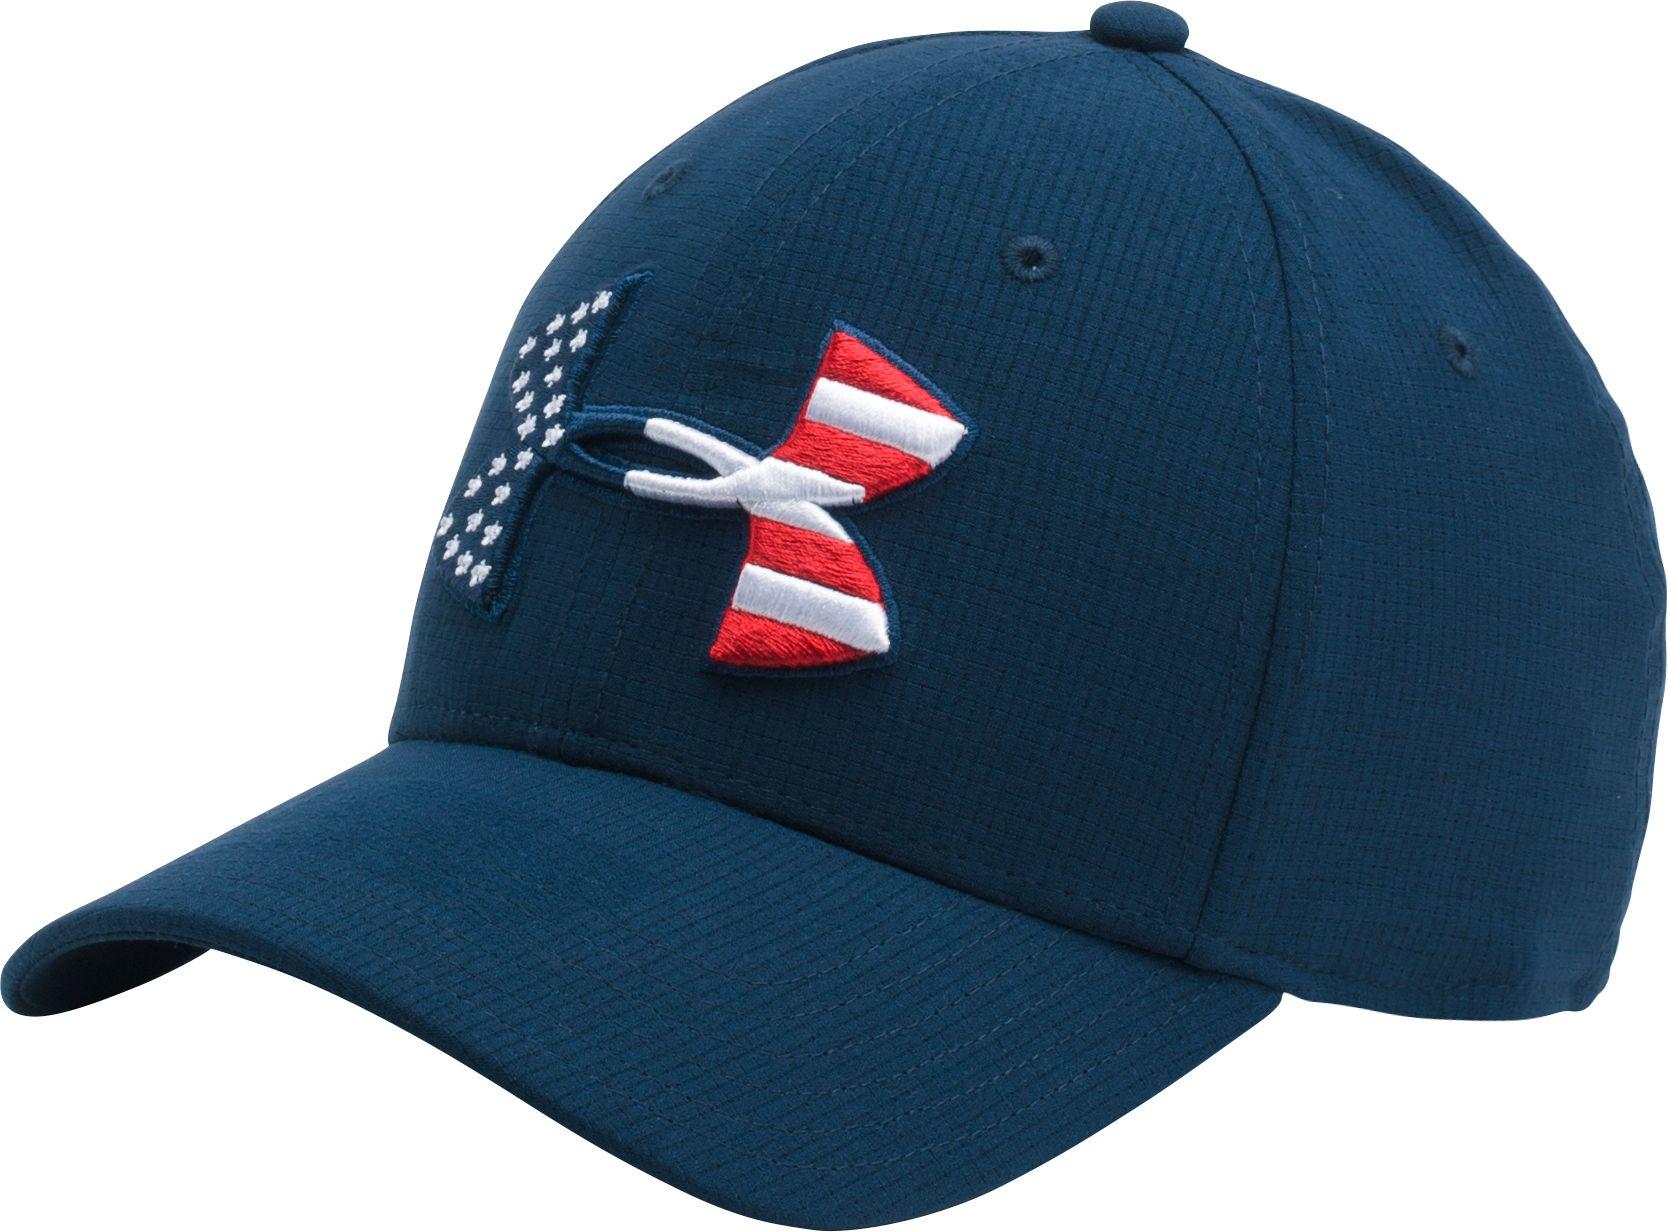 Attirant Under Armour Menu0027s Big Flag Logo Stretch Fit Hat 2.0   DICKu0027S Sporting Goods